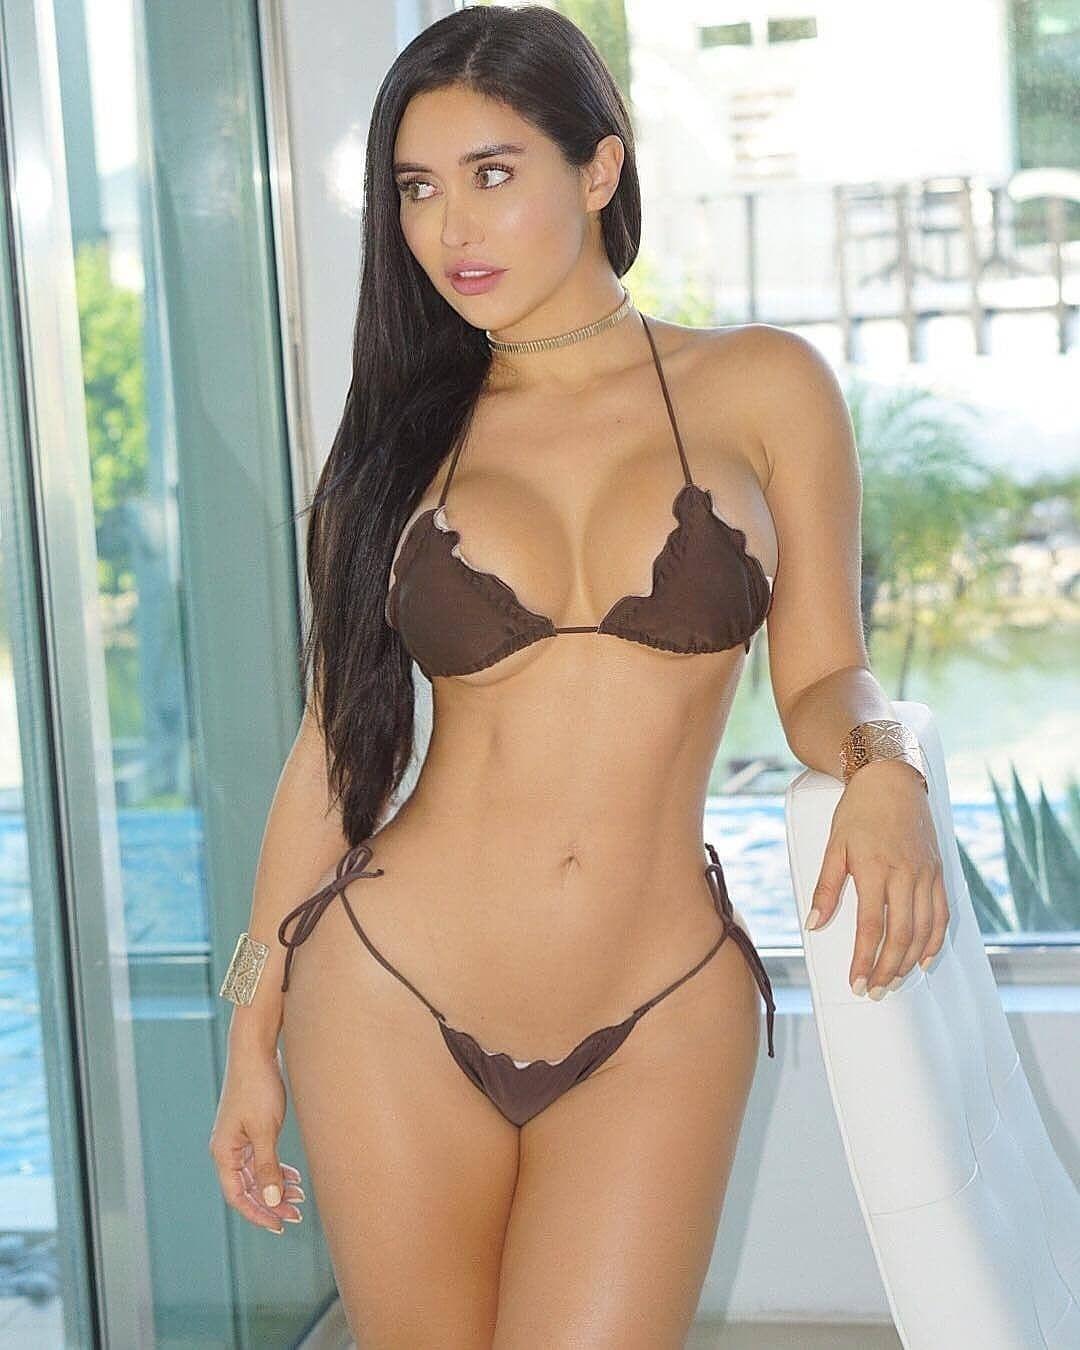 nude (65 photo), Sexy Celebrites pictures